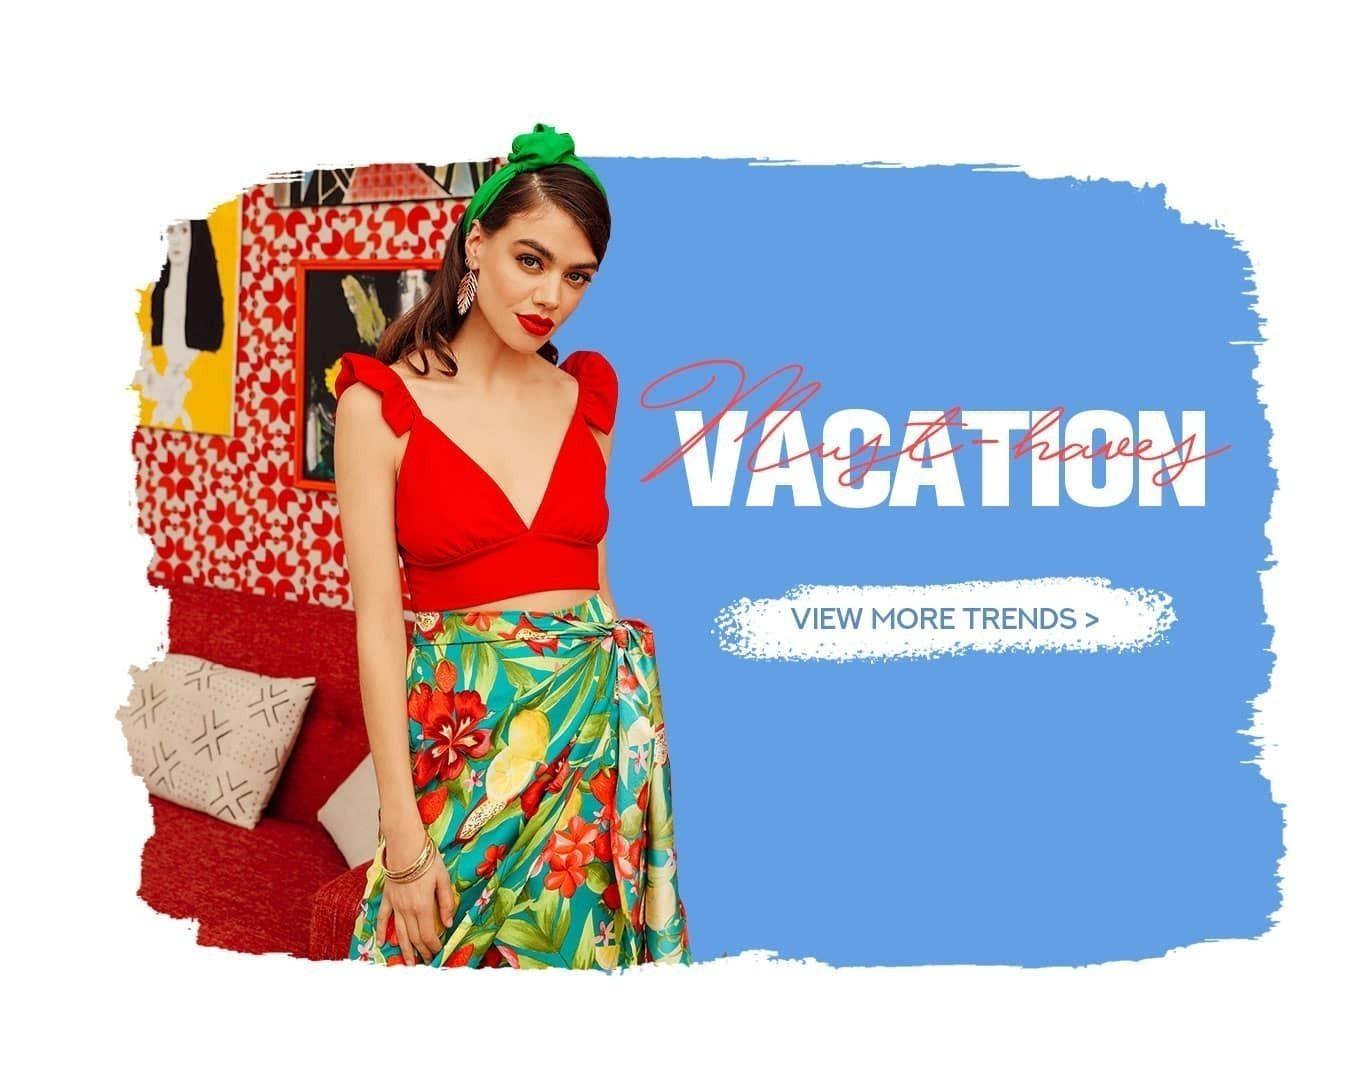 93467bf6f Shop Trendy Women s Fashion